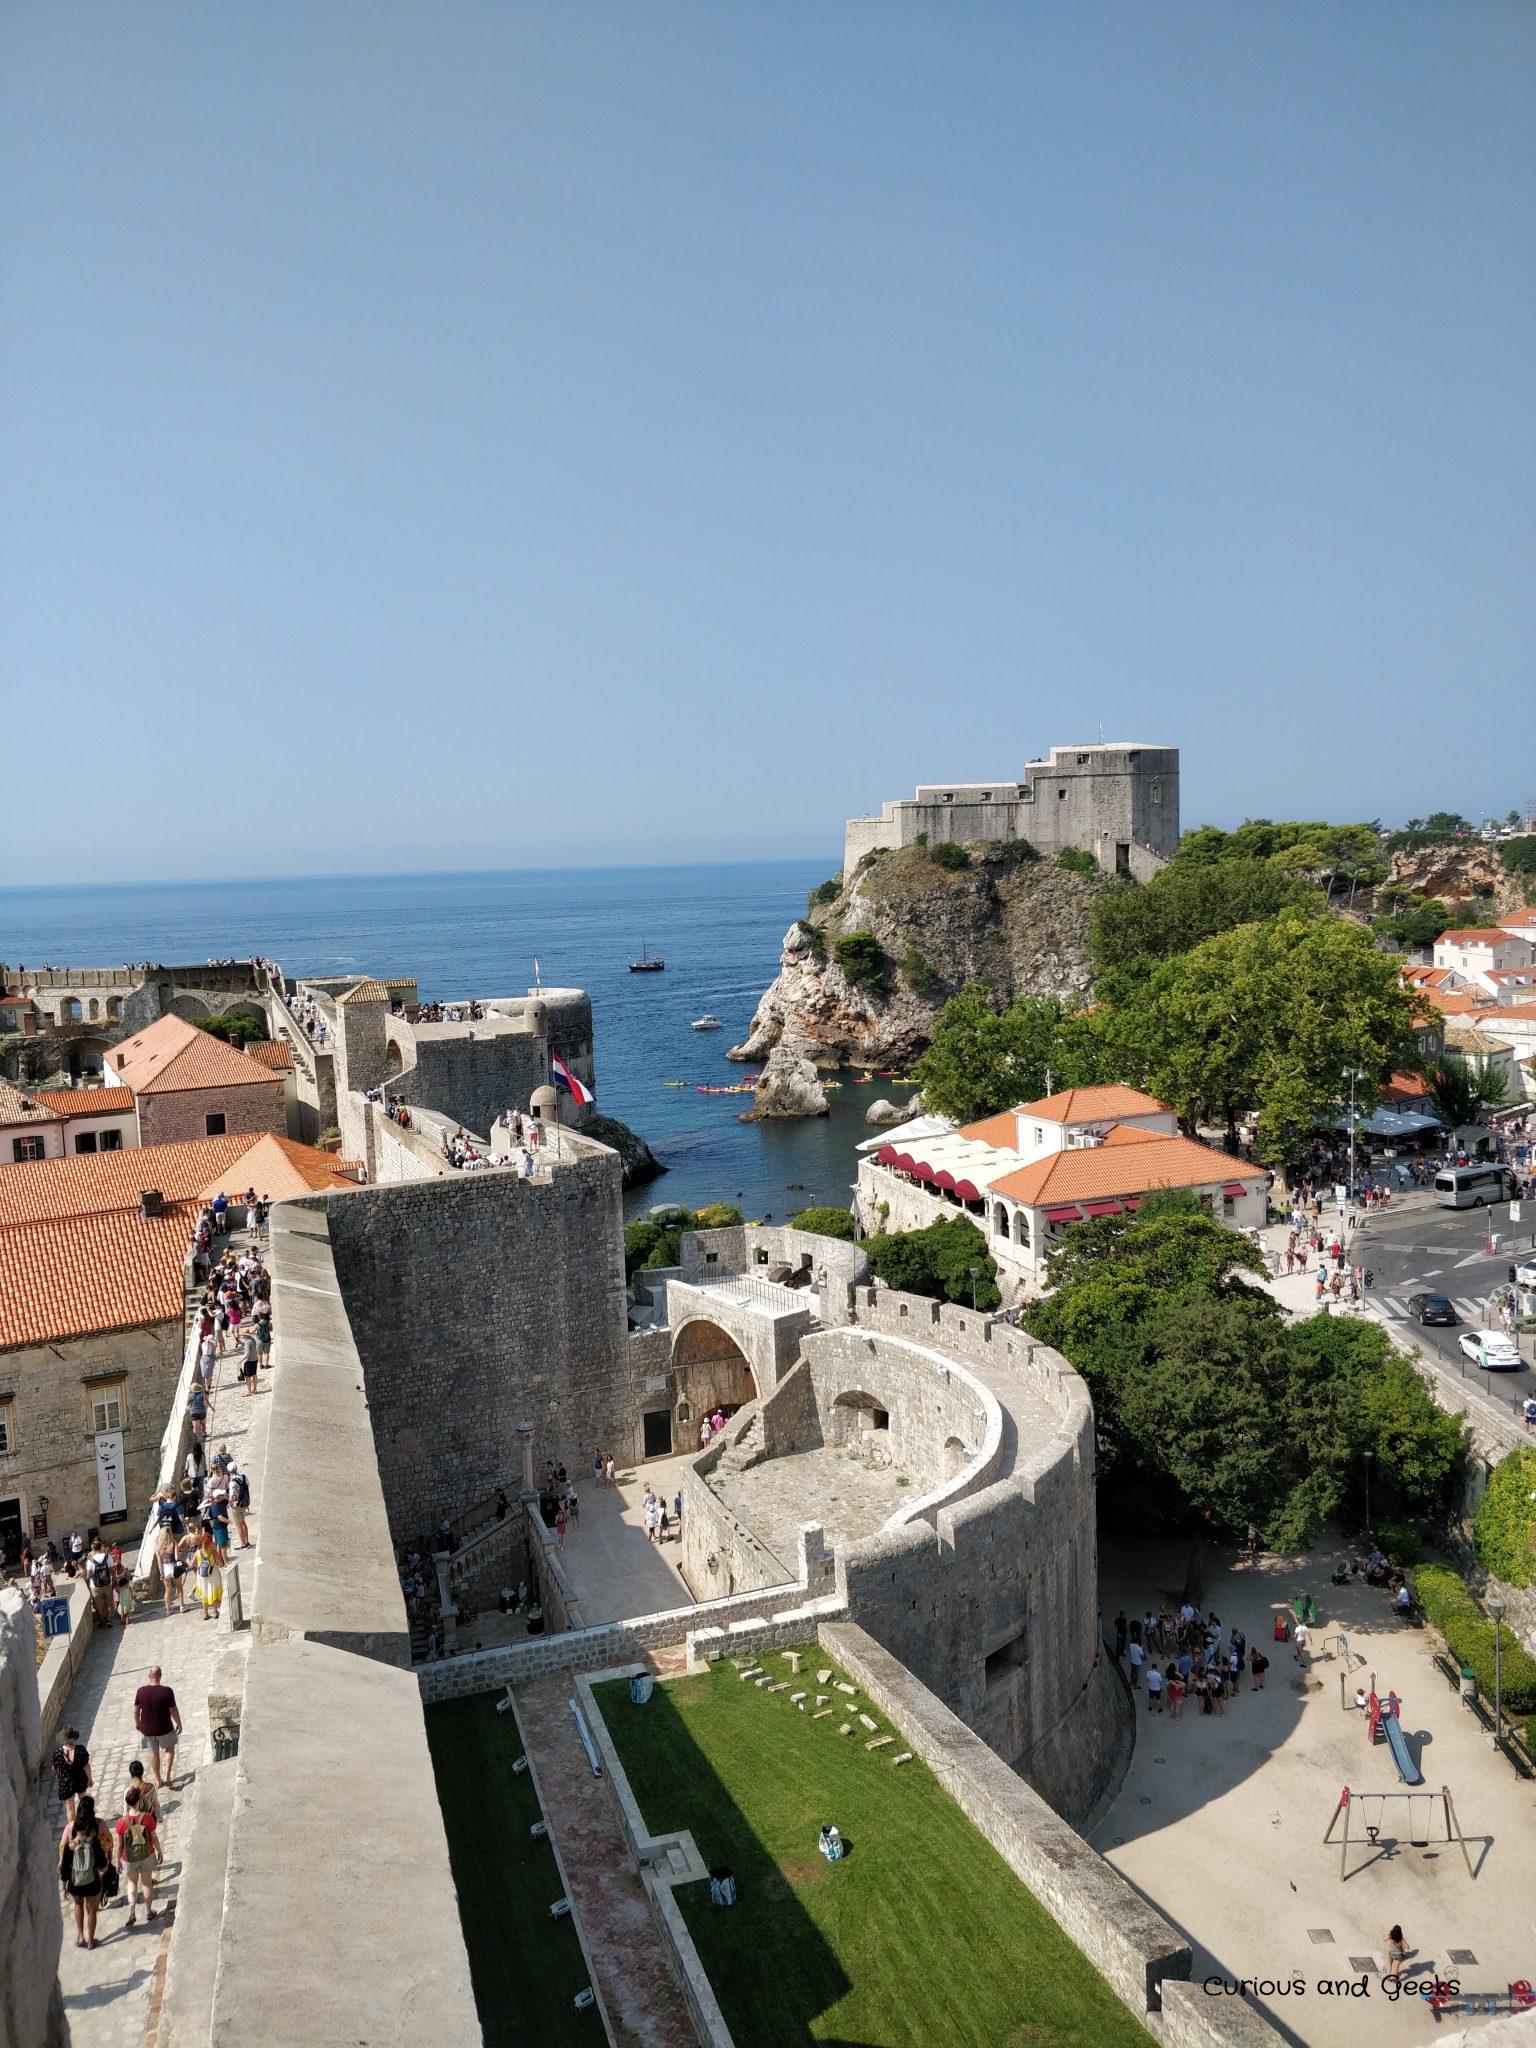 8. Practice 2 - Game of Thrones filming locations in Dubrovnik